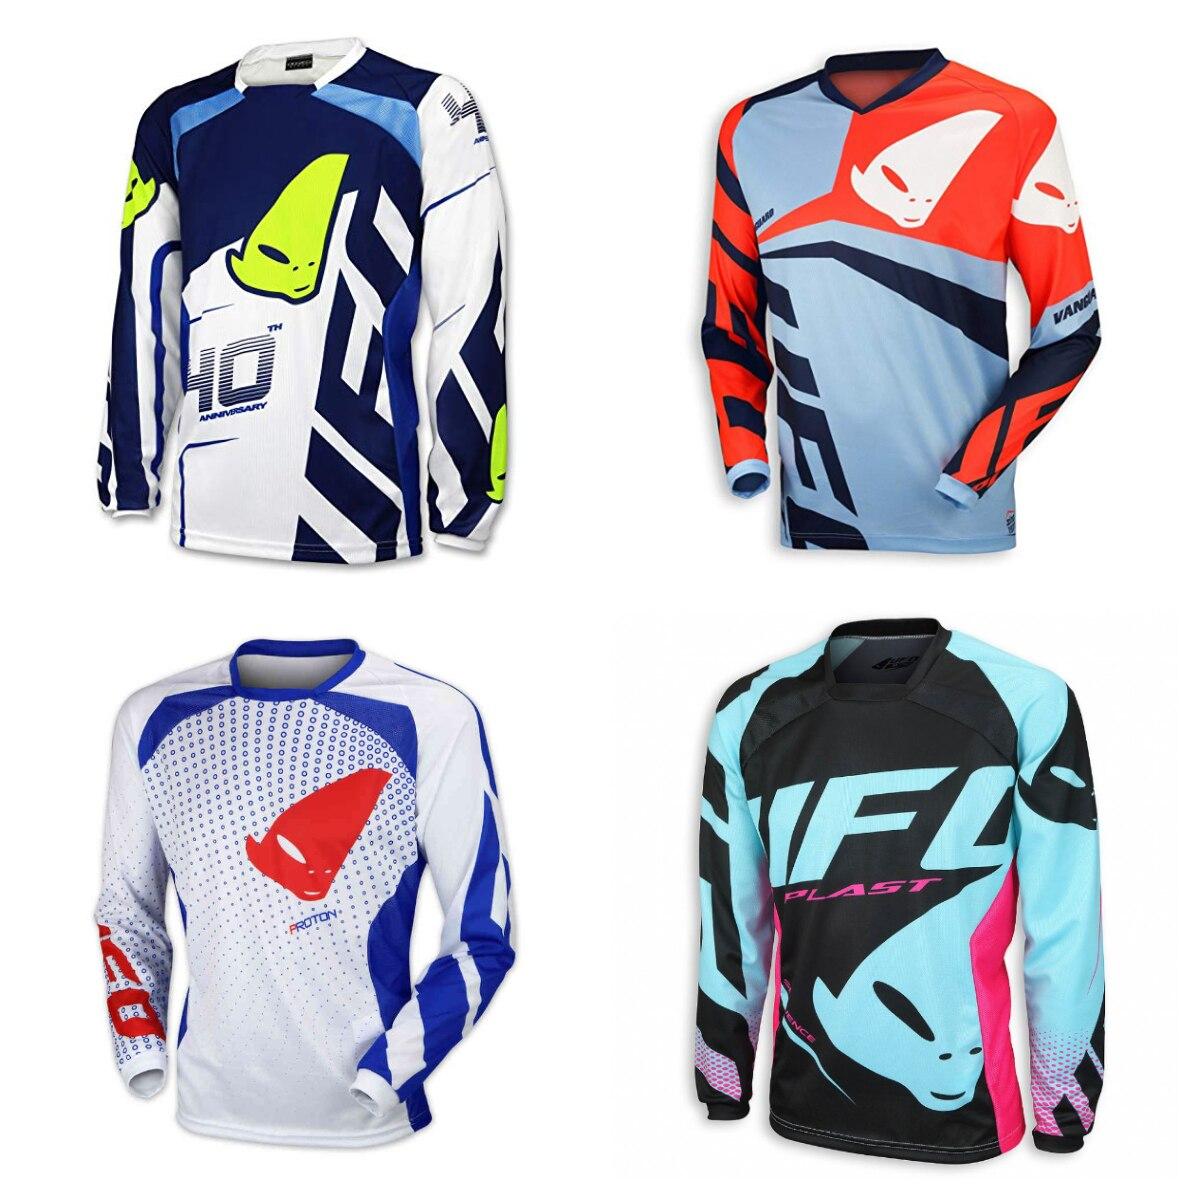 2019 Manga Longa Camisa Moto Downhill Jersey Motocross Motocicleta Mountain Bike Jersey SPEXCEL MTB/MX/DH Ciclismo Inverno